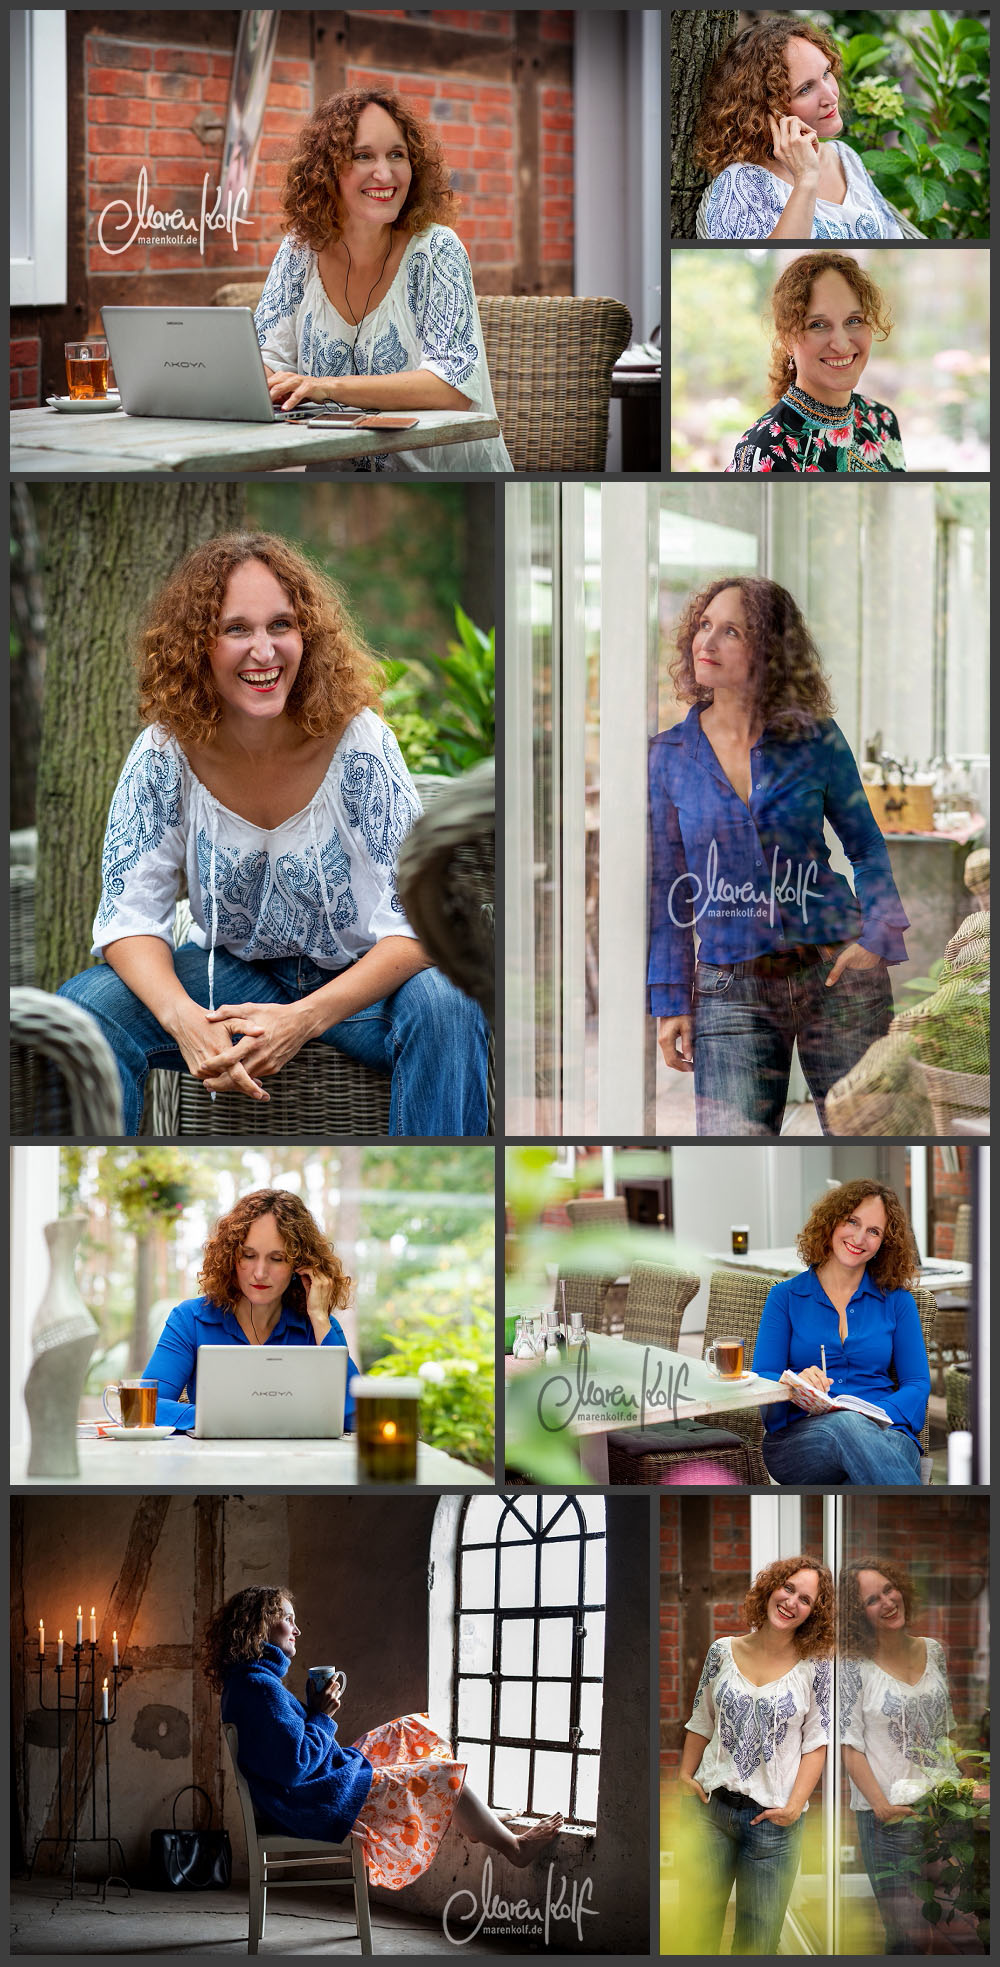 businessportraits-hannover-heidrun-klaua-liebescoach-seelenpartner-maren-kolf-fotografie